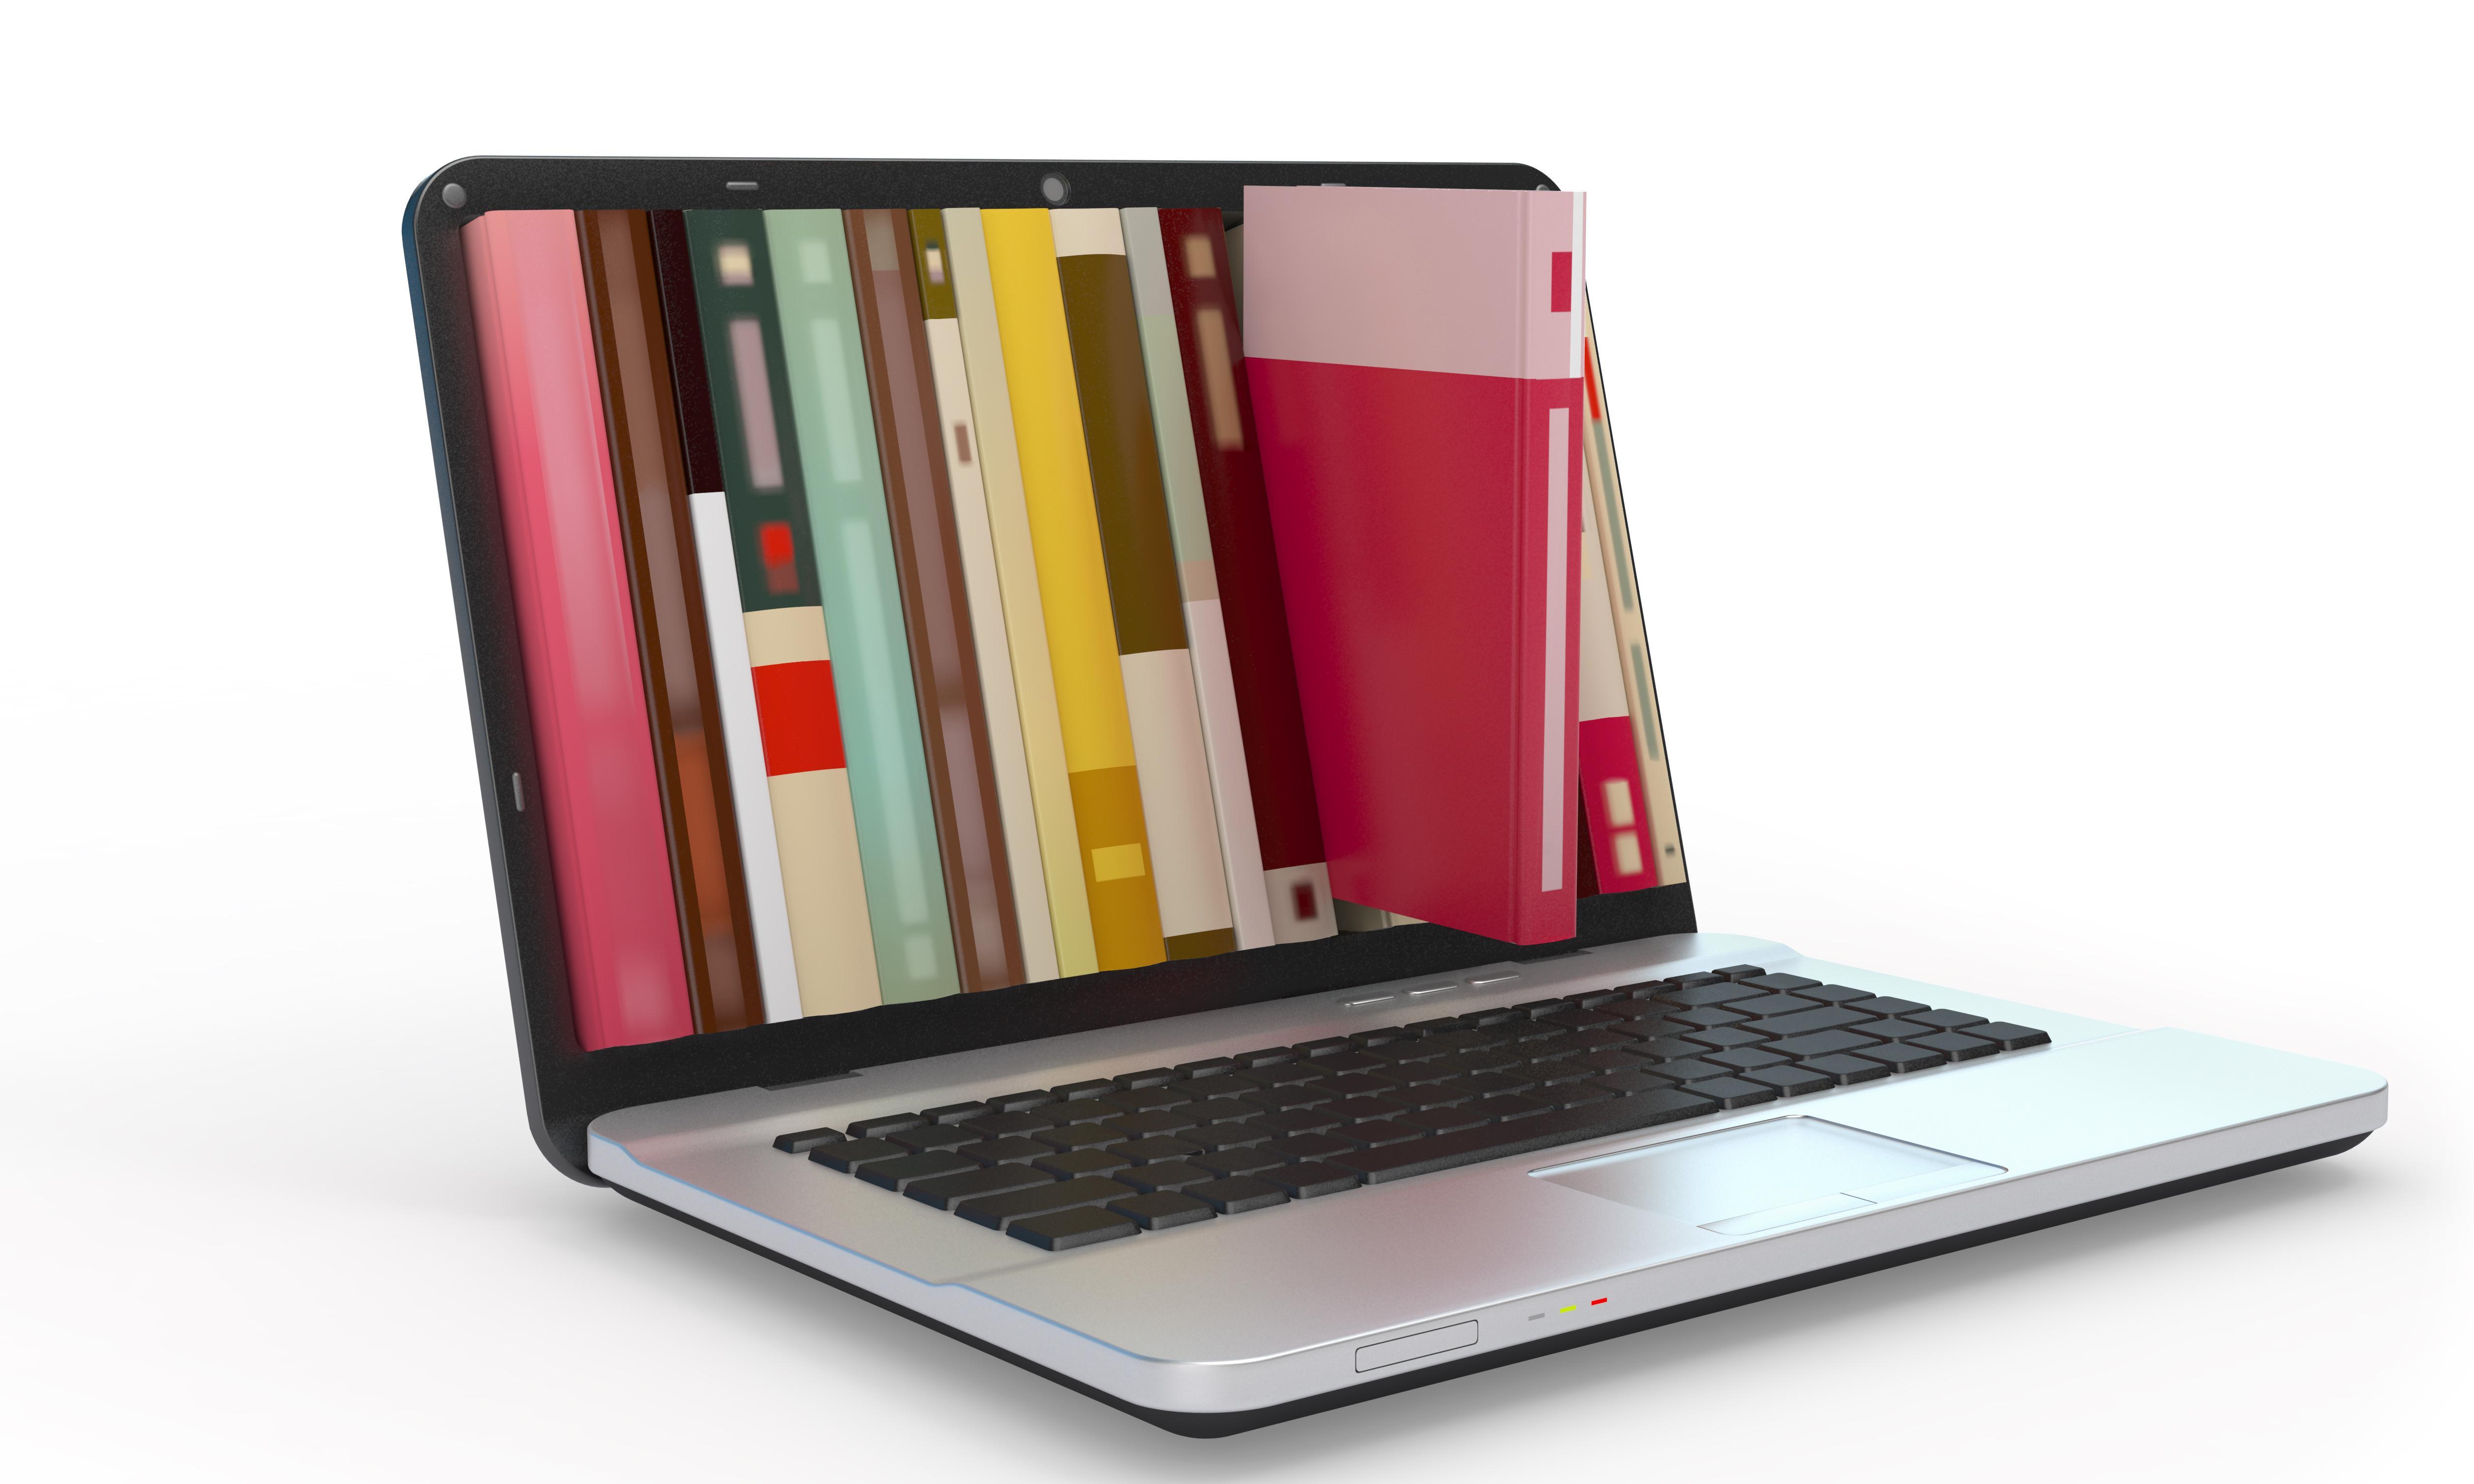 Internet Archive's ebook loans face UK copyright challenge